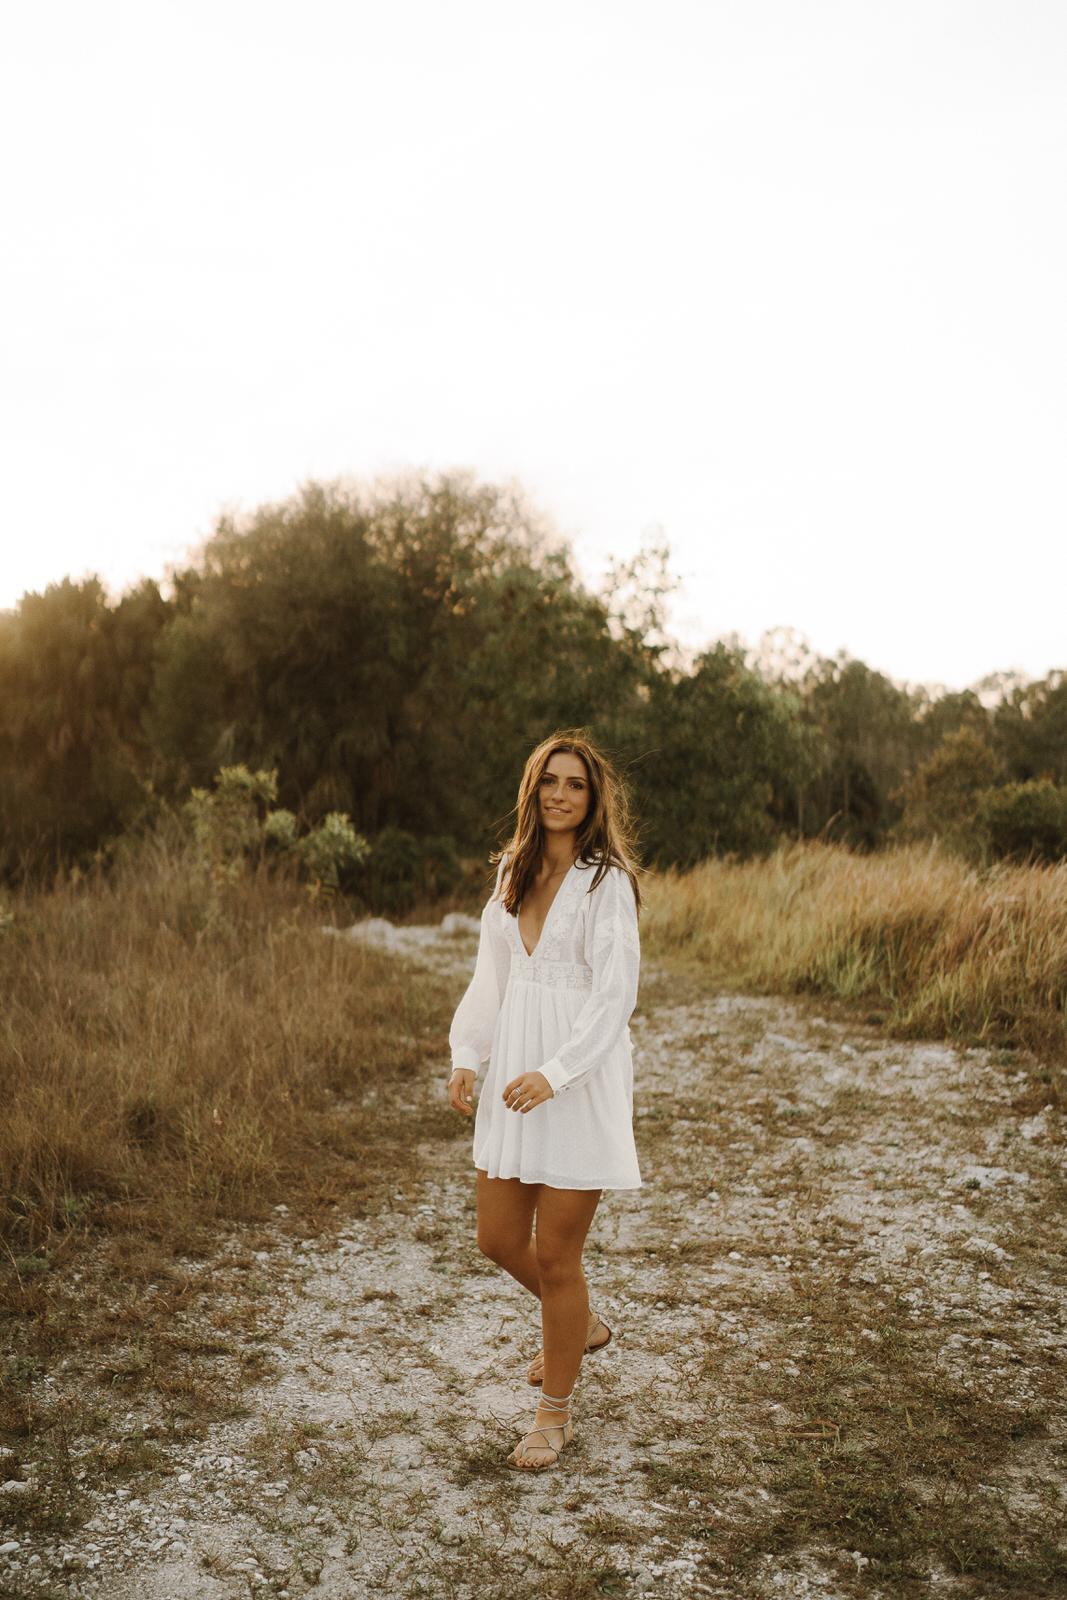 Fort Myers Senior Photos- Michelle Gonzalez Photography- Kate McQuagge-115.JPG